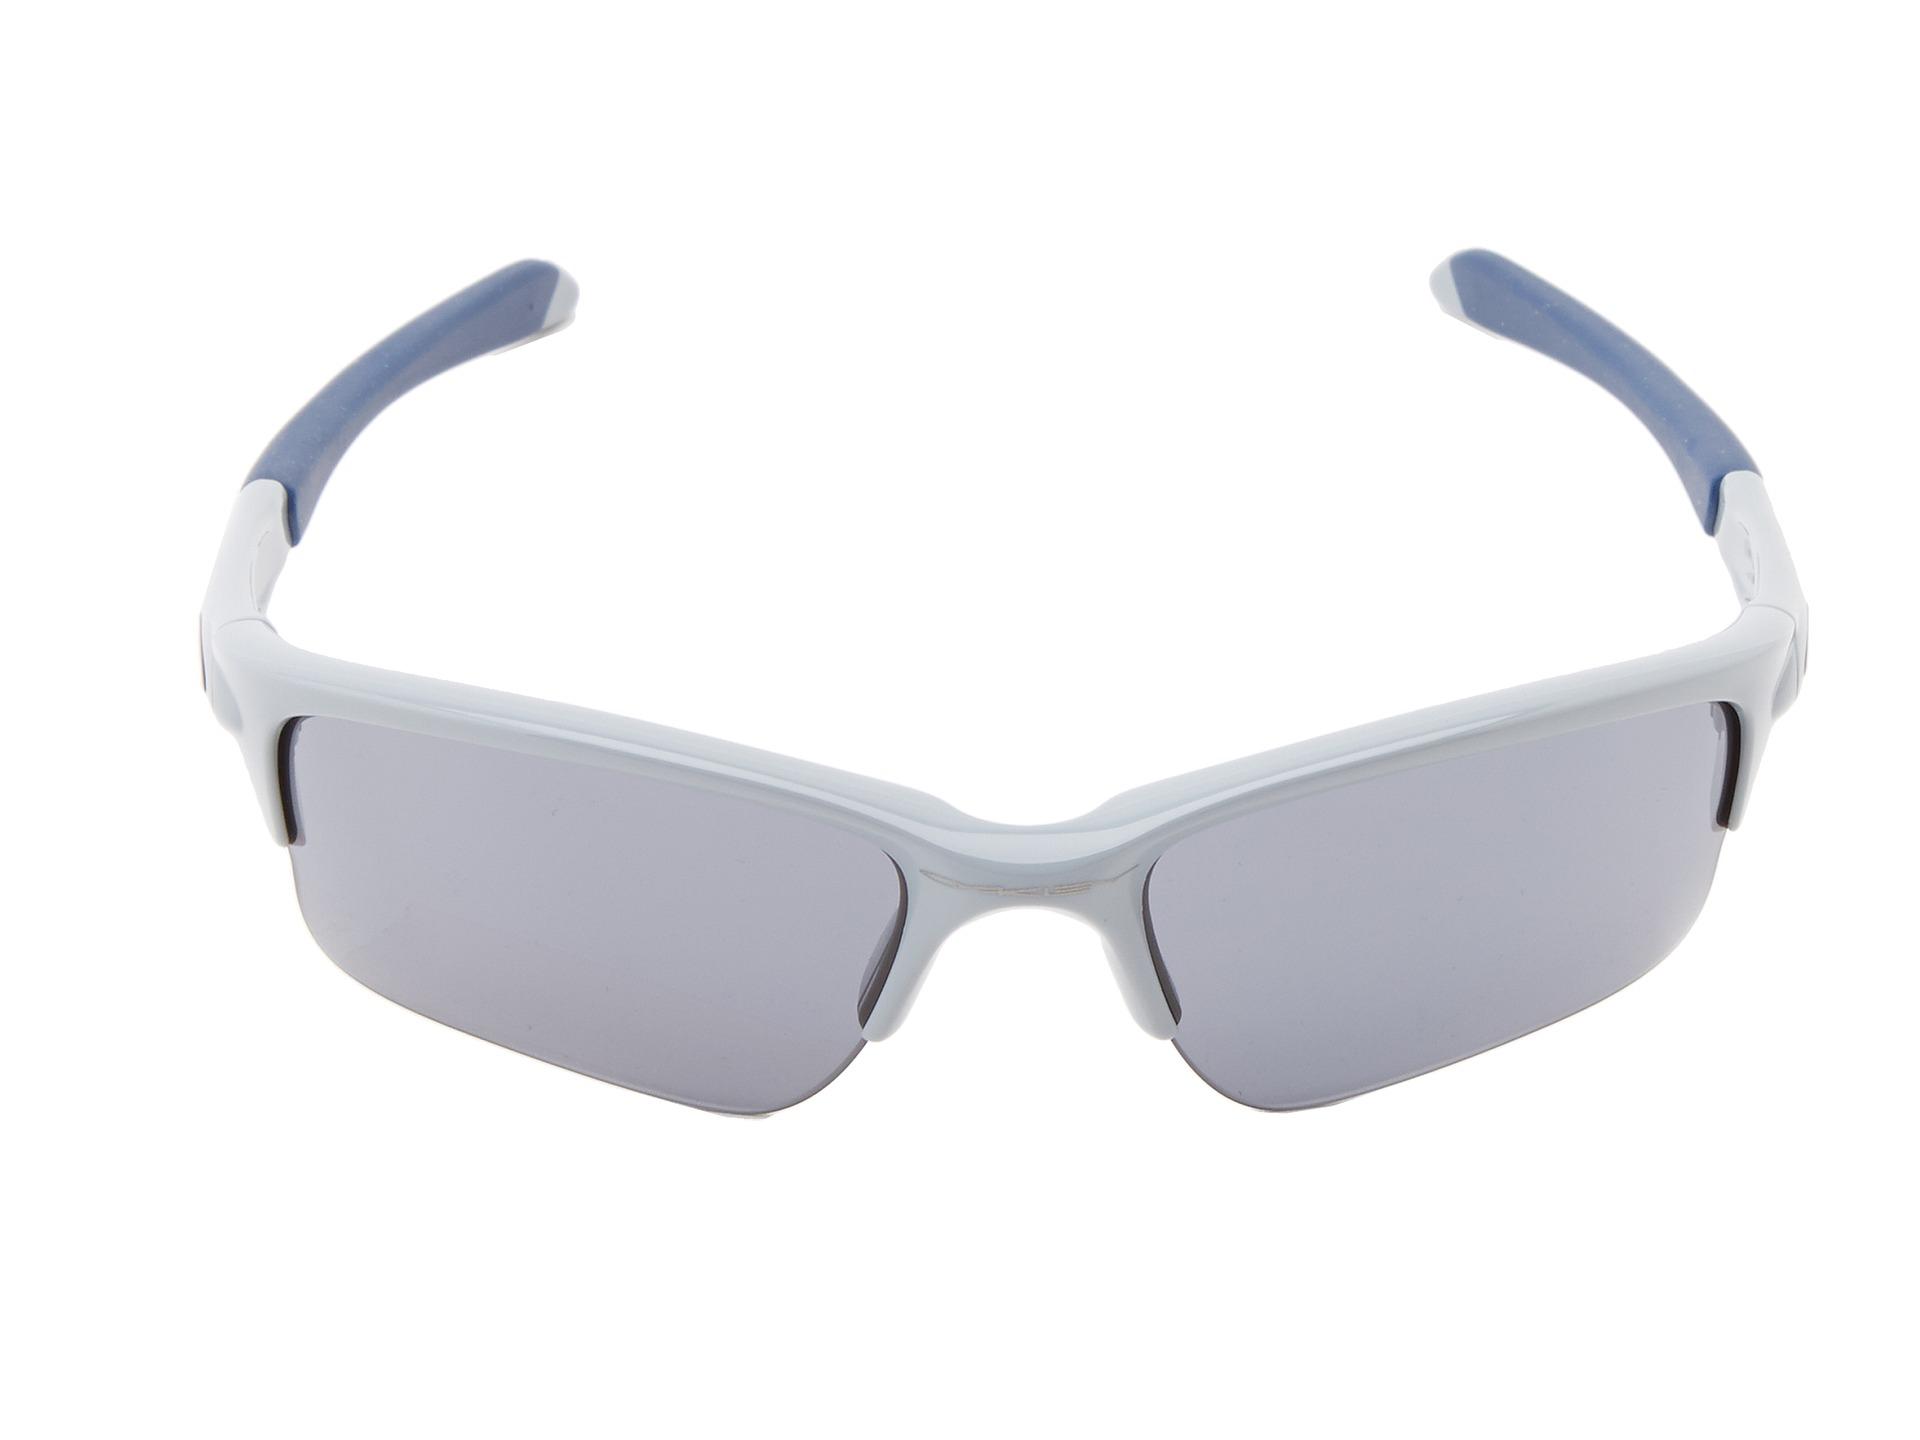 cheapest oakley flak jacket sunglasses polarized